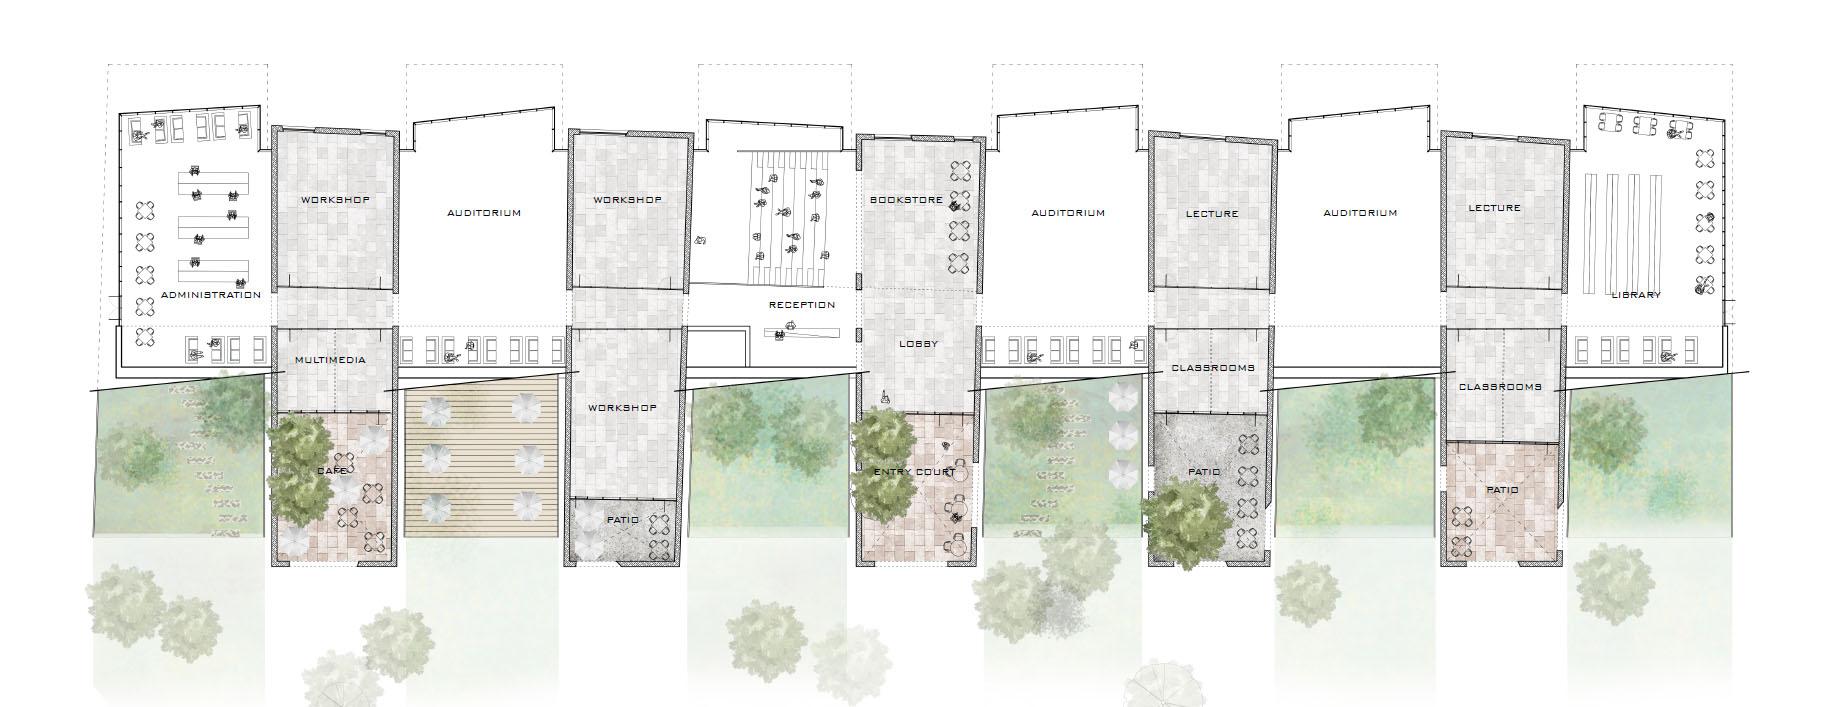 Art Institute Plan.jpg